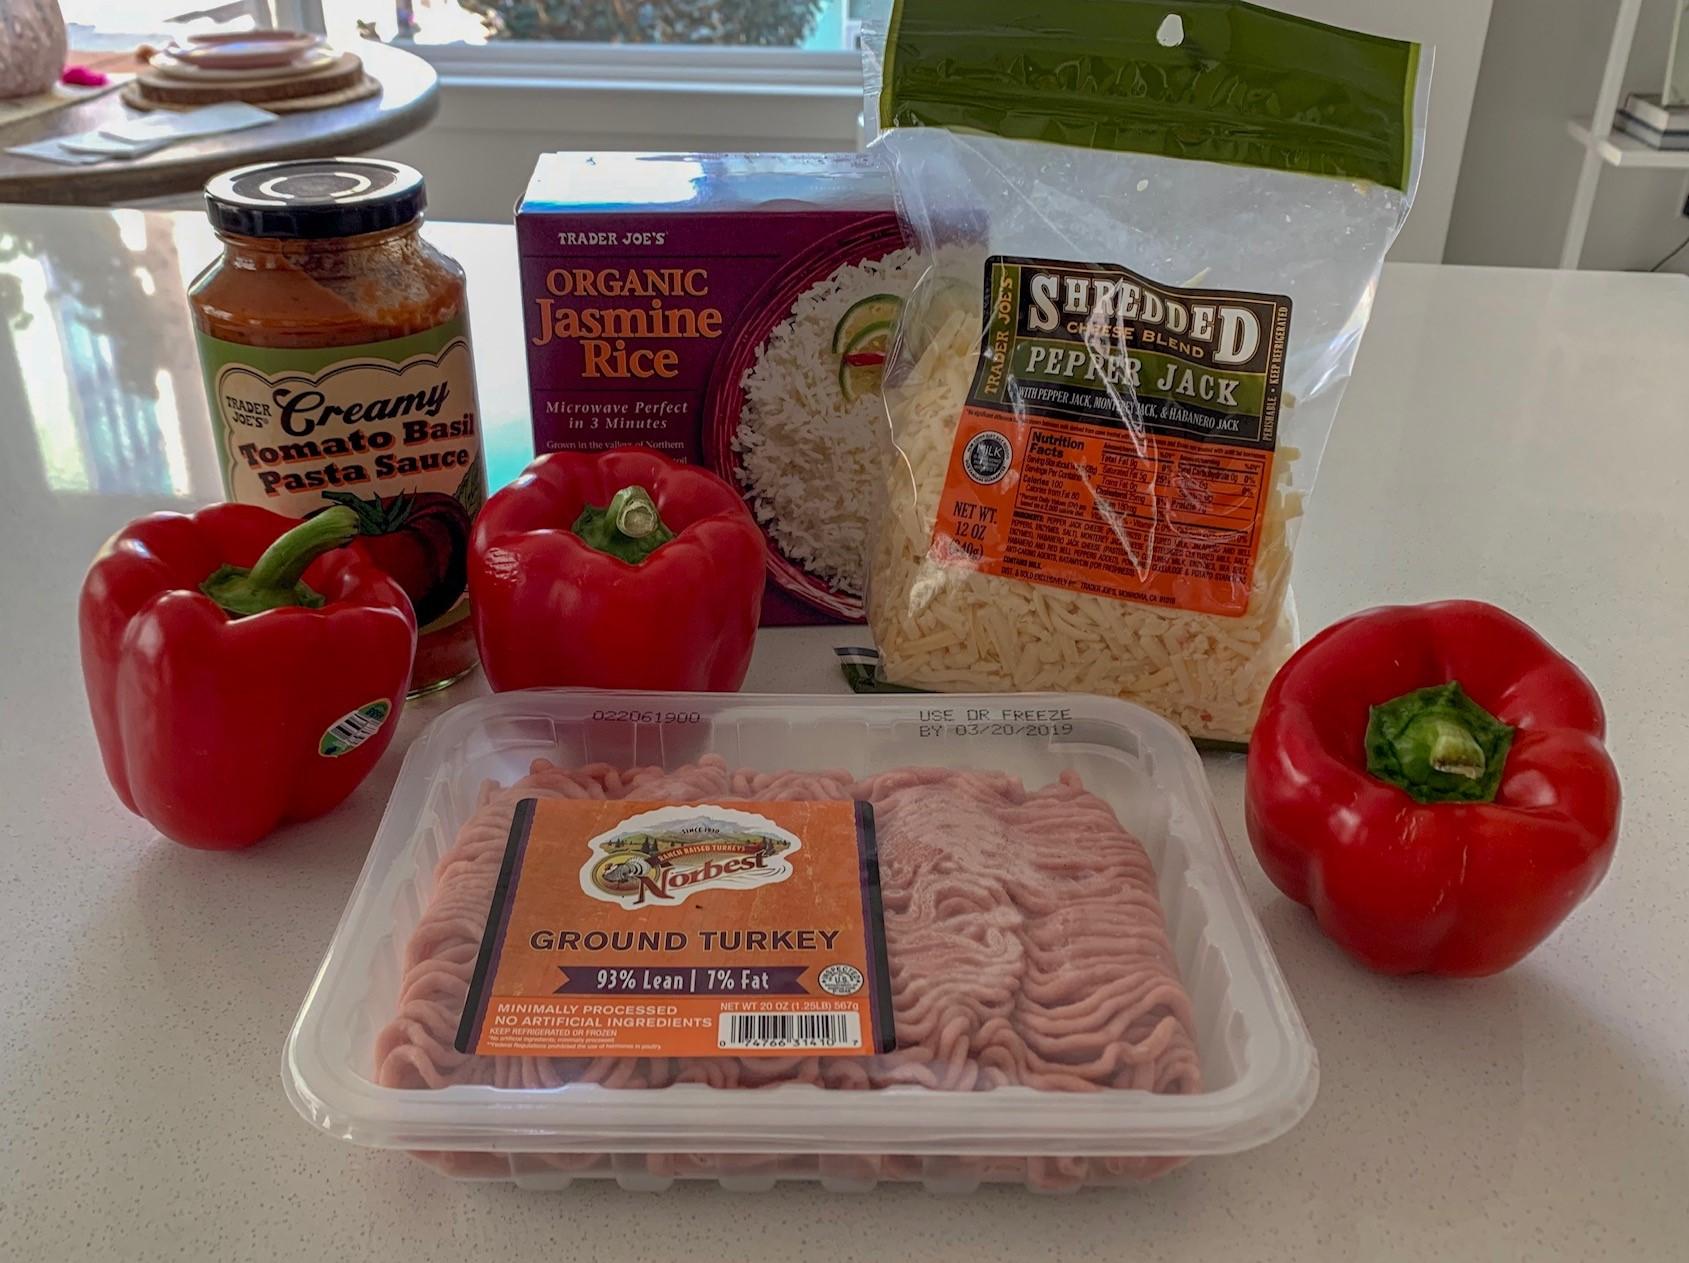 Ingredients from Trader Joe's